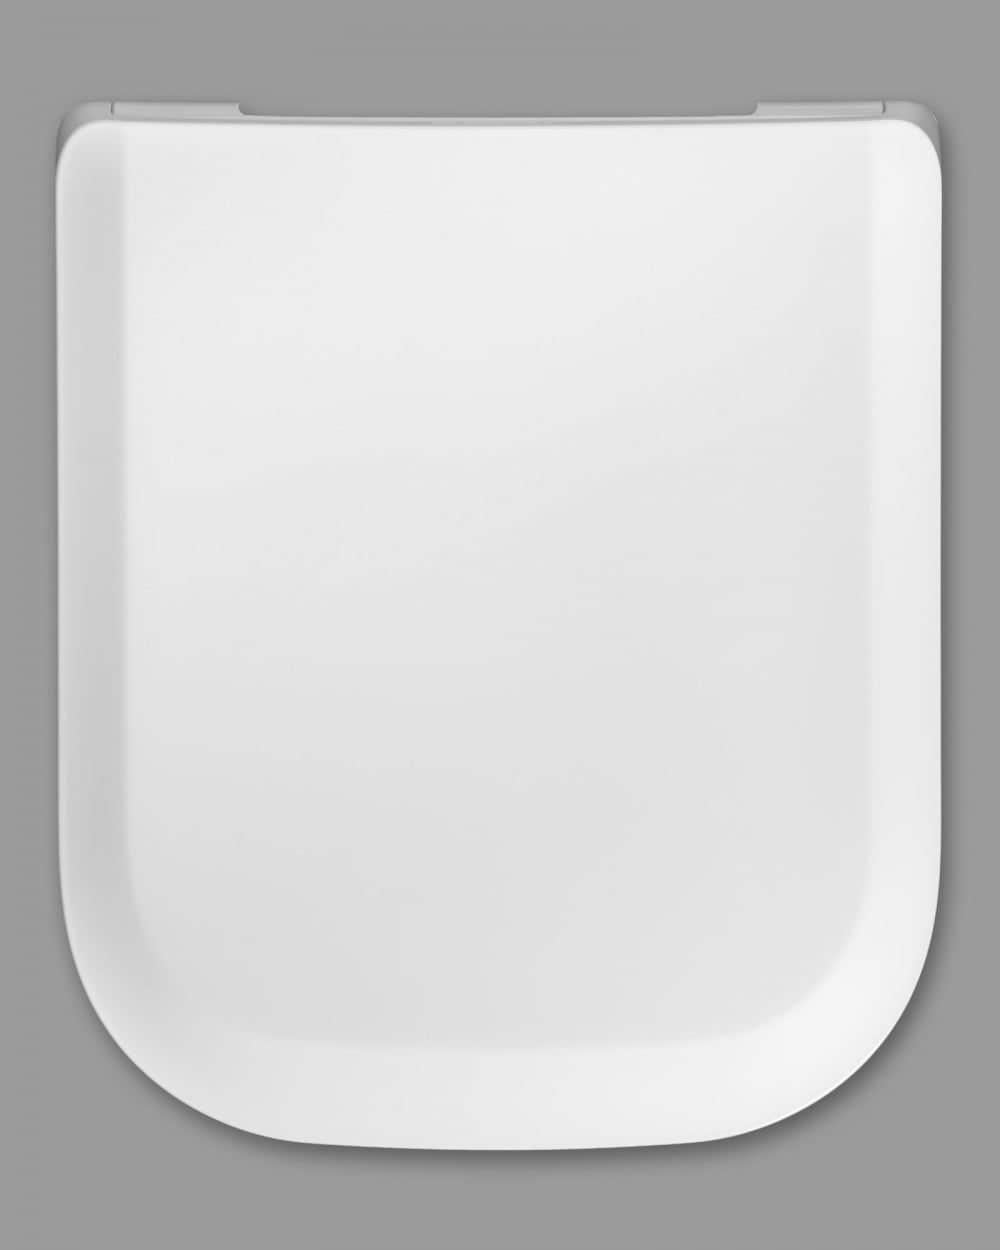 WC-Sitze VIGOUR WC-Sitz derby style